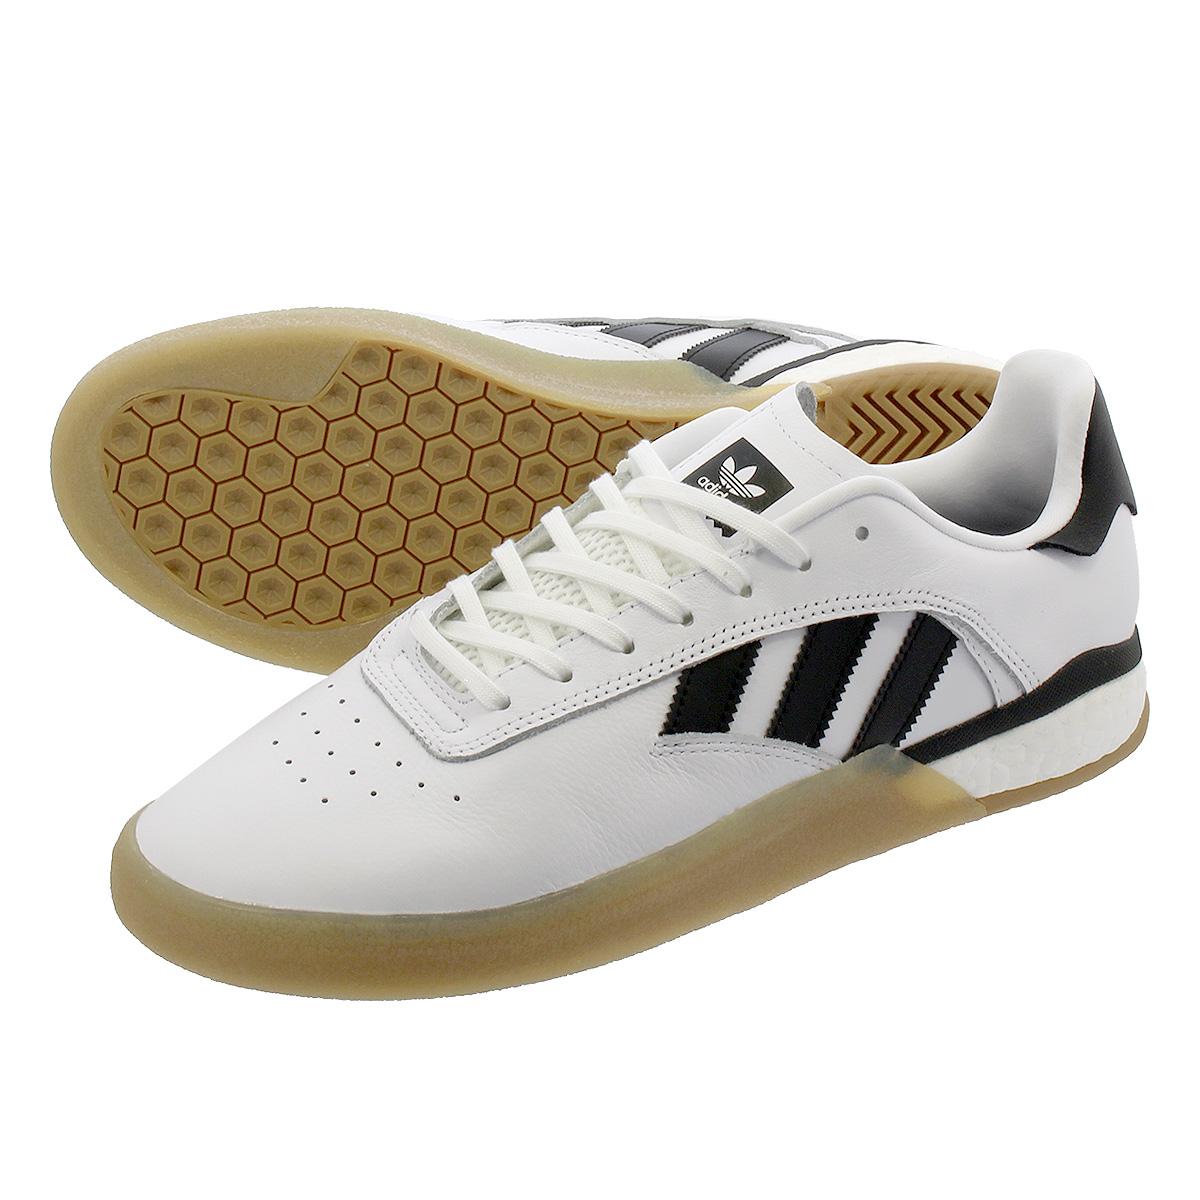 adidas Skateboarding 3ST.004 Shoes (white core black gum)